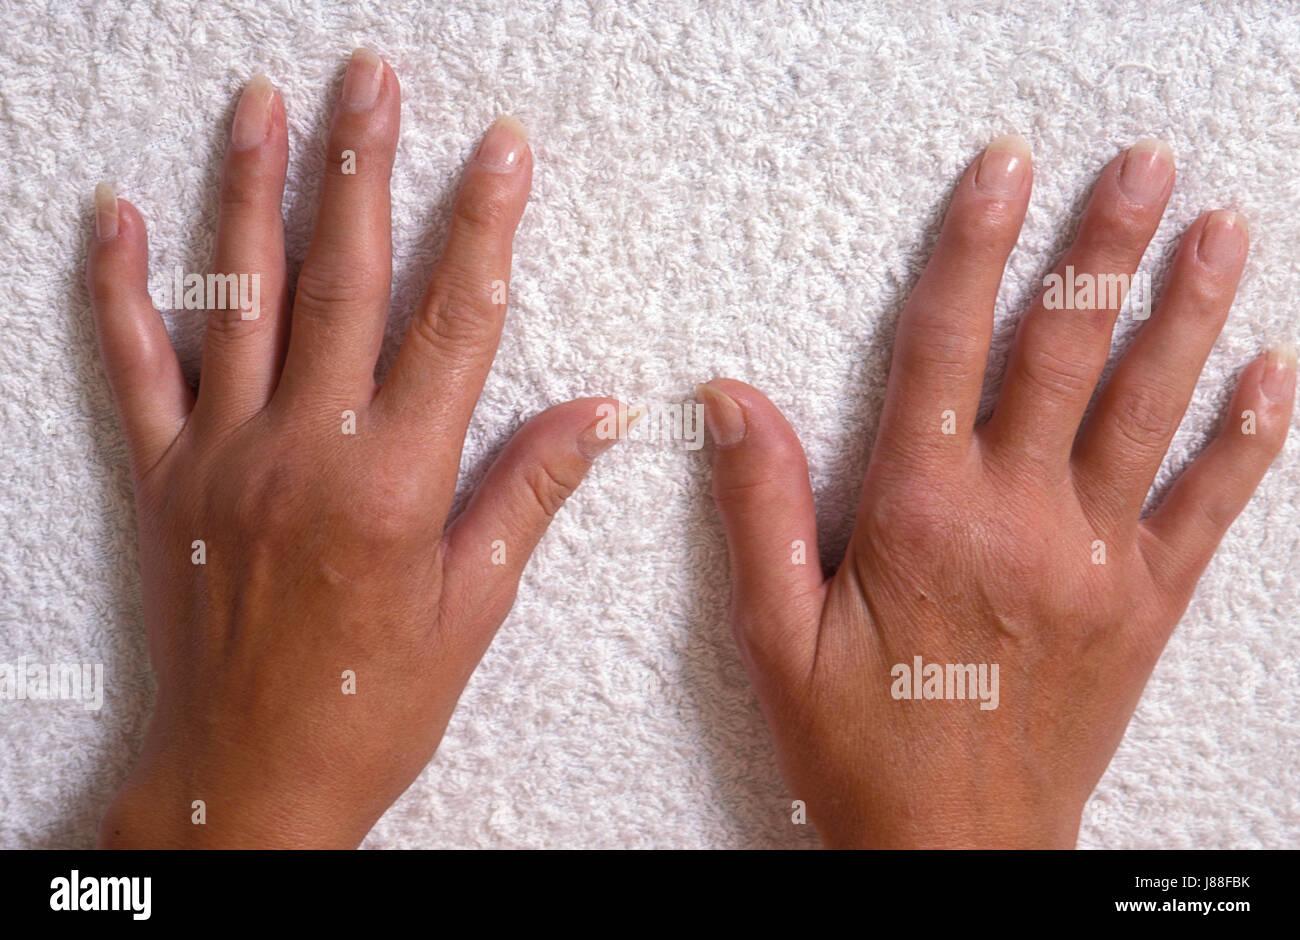 Les mains des femmes adultes souffrant de polyarthrite rhumatoïde ...